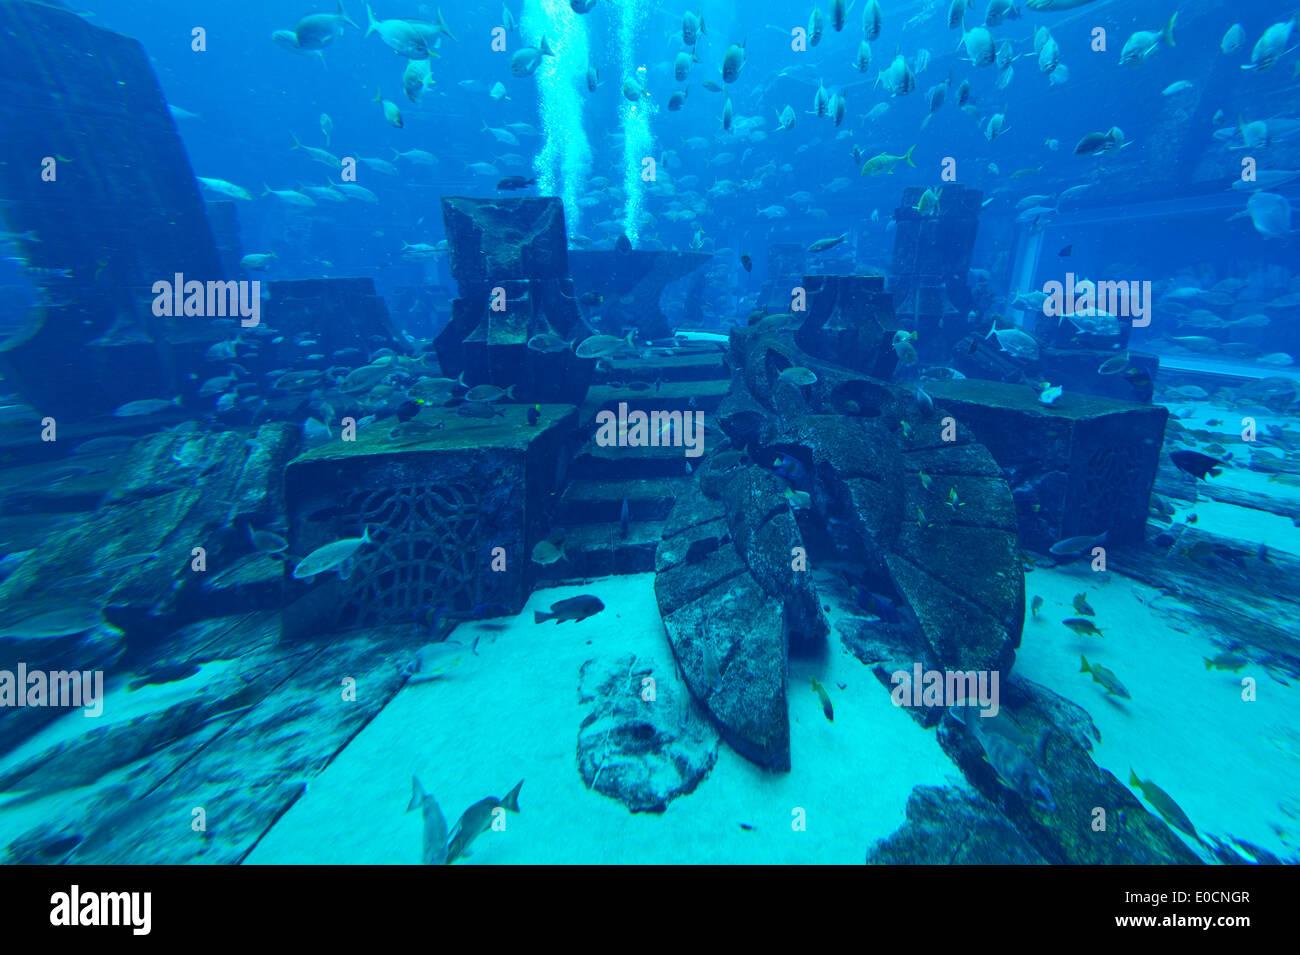 A Recreation Of Sea Life In A Gigantic Aquarium At The